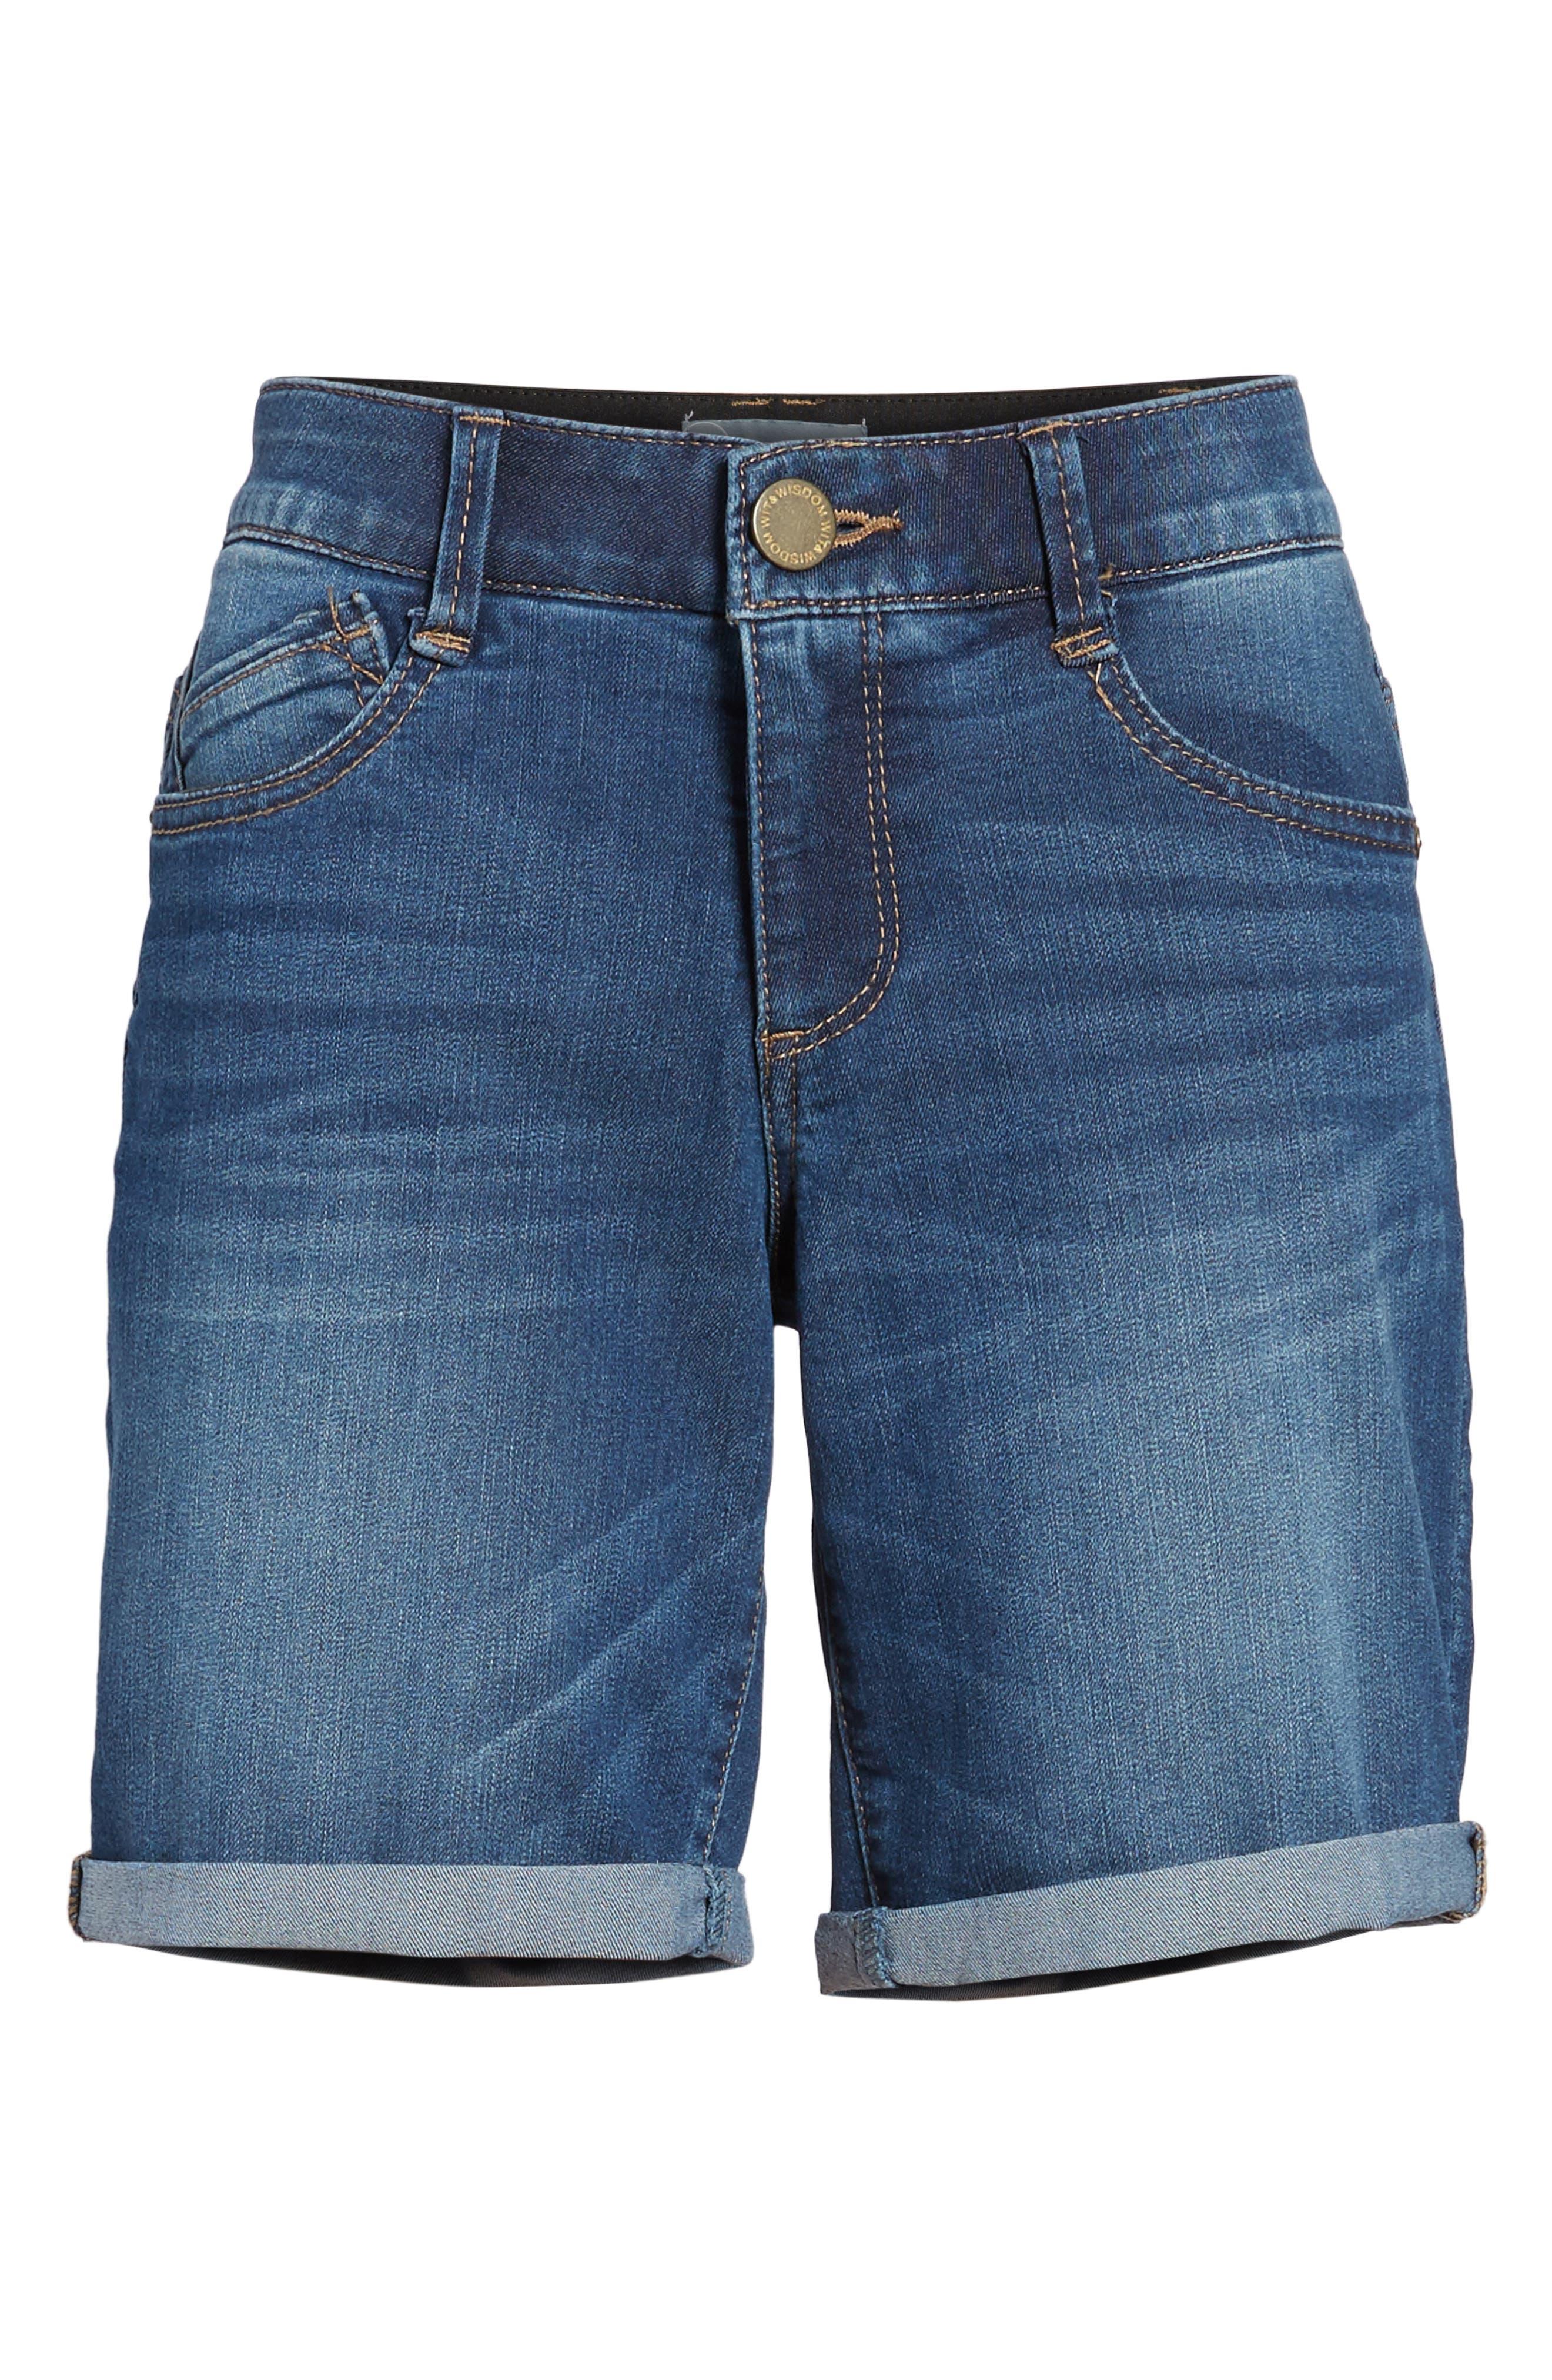 WIT & WISDOM, Ab-solution Cuffed Denim Shorts, Alternate thumbnail 7, color, BLUE